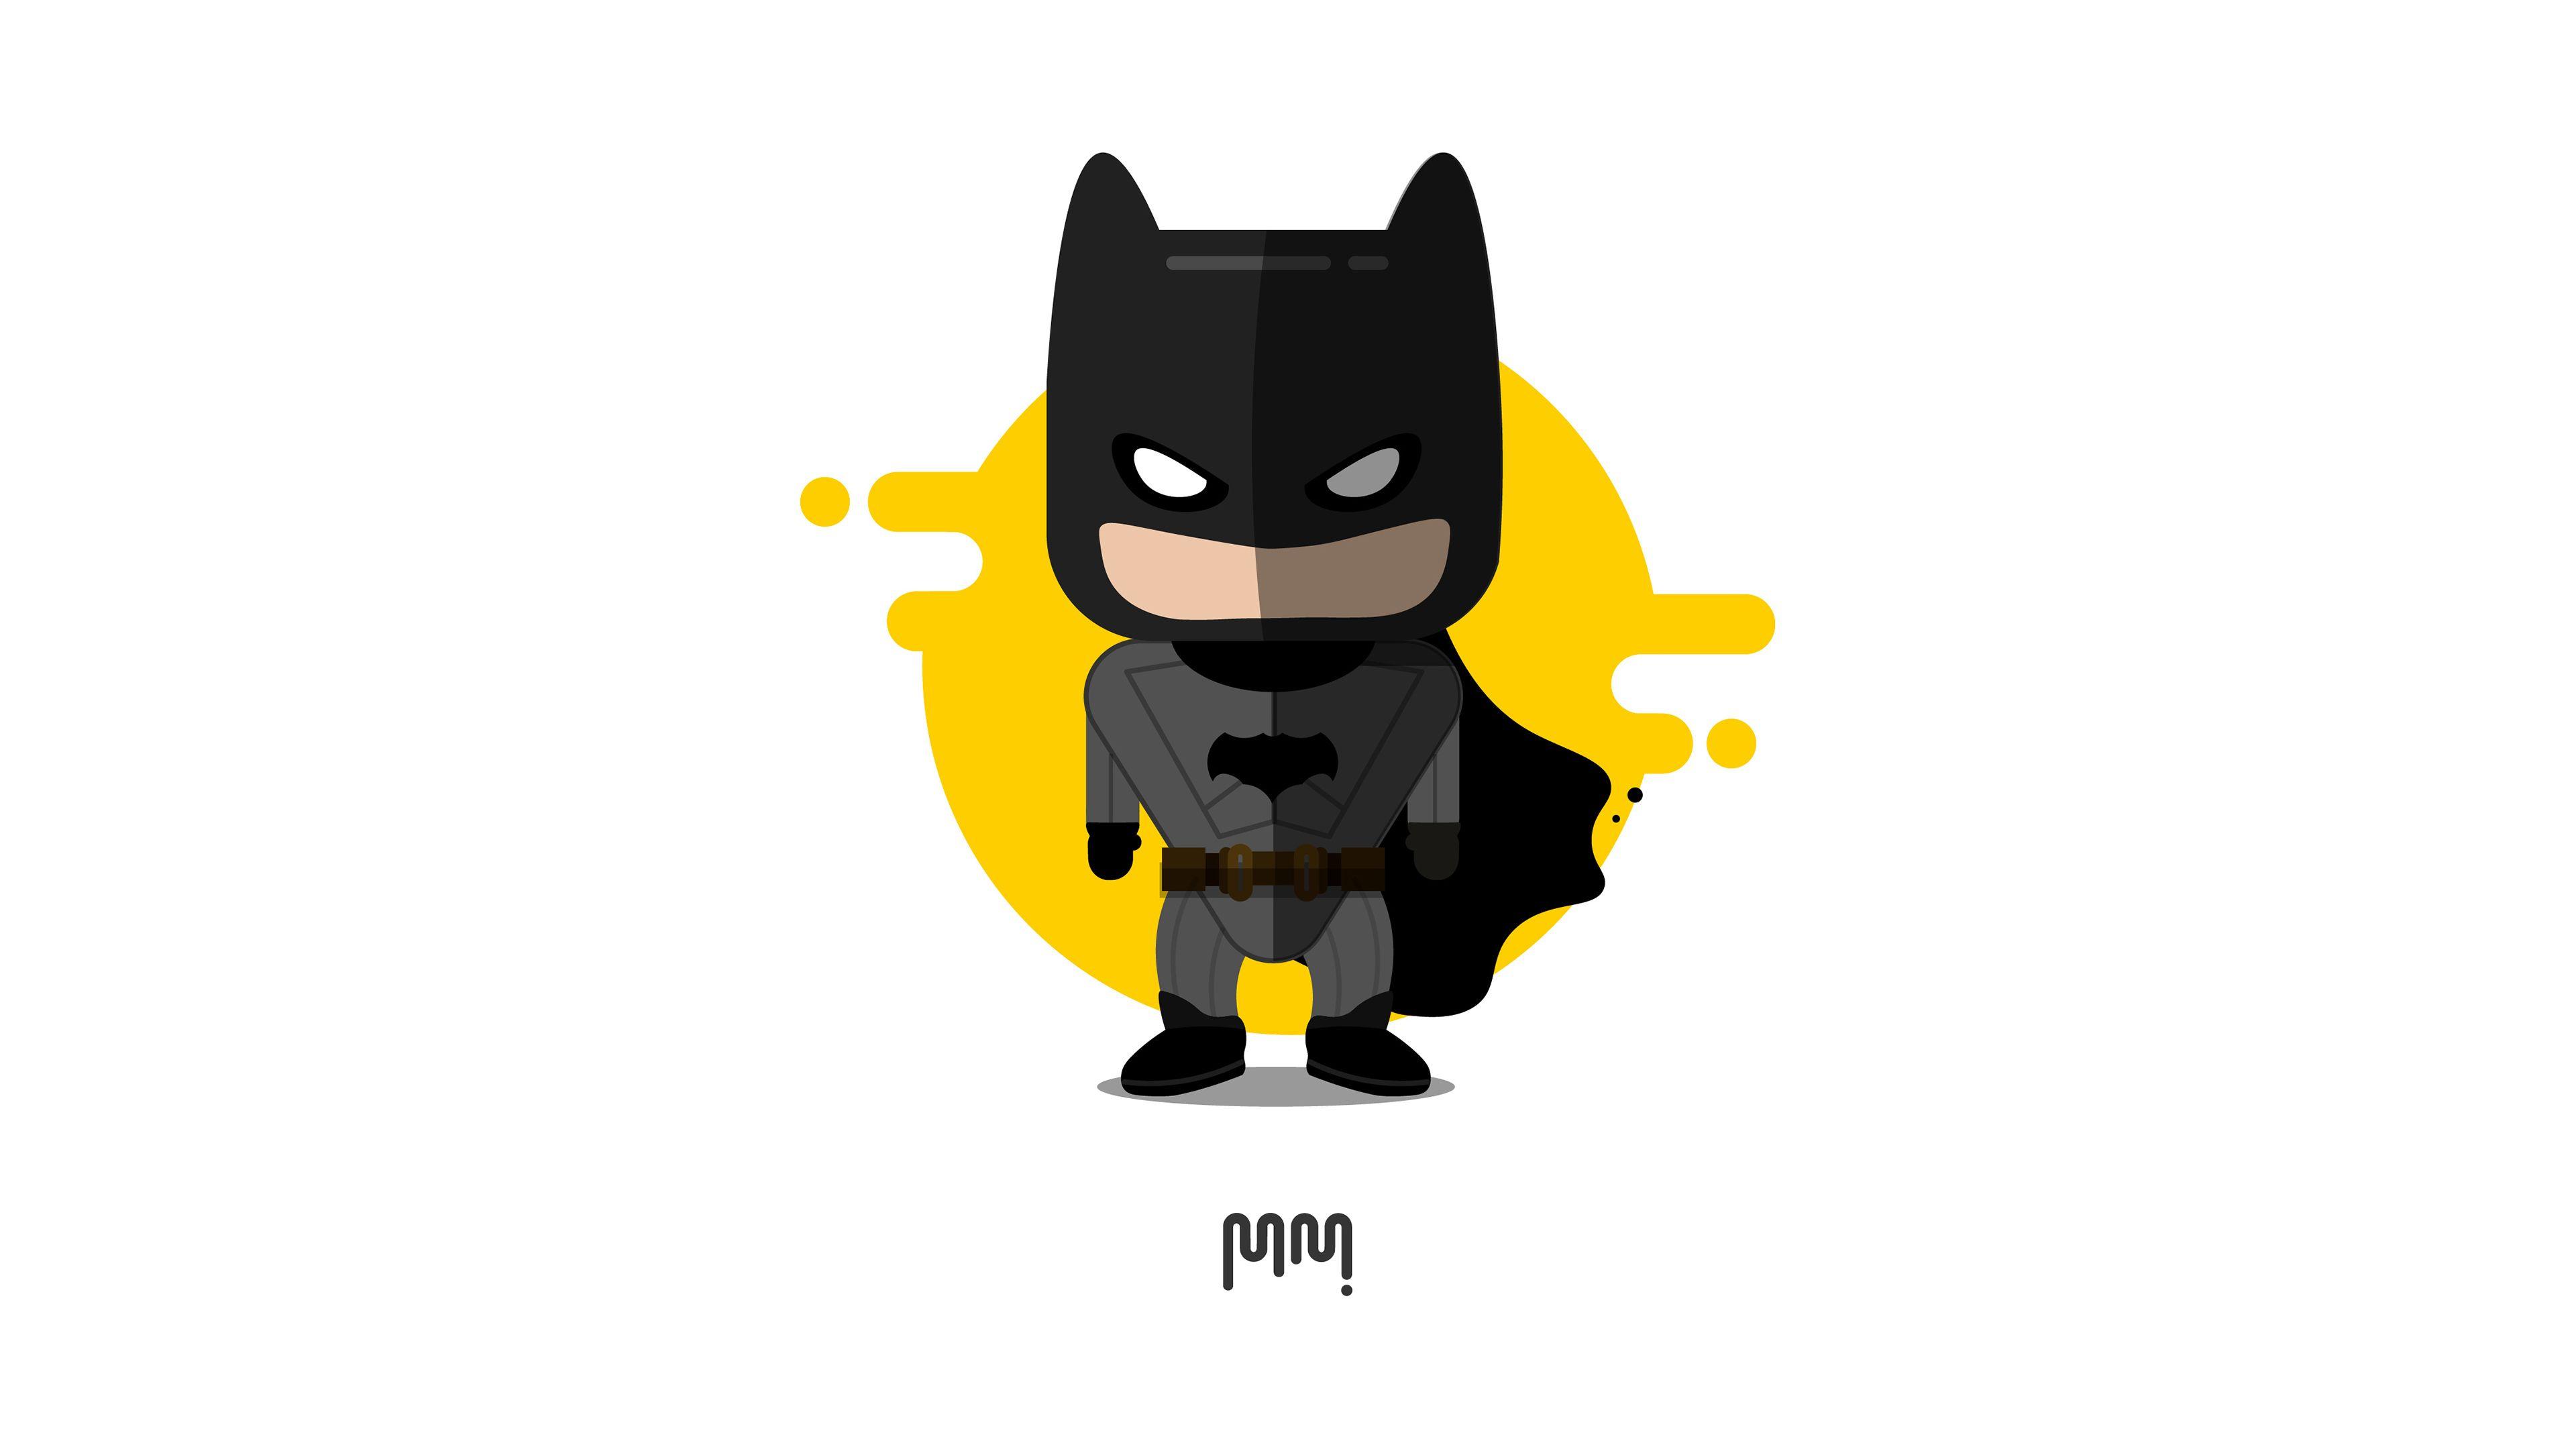 Cute Little Batman Minimalism 4k Superheroes Wallpapers Hd Wallpapers Digital Art Wallpapers Behance Wallpapers Batman Wallpaper Cute Batman Art Wallpaper